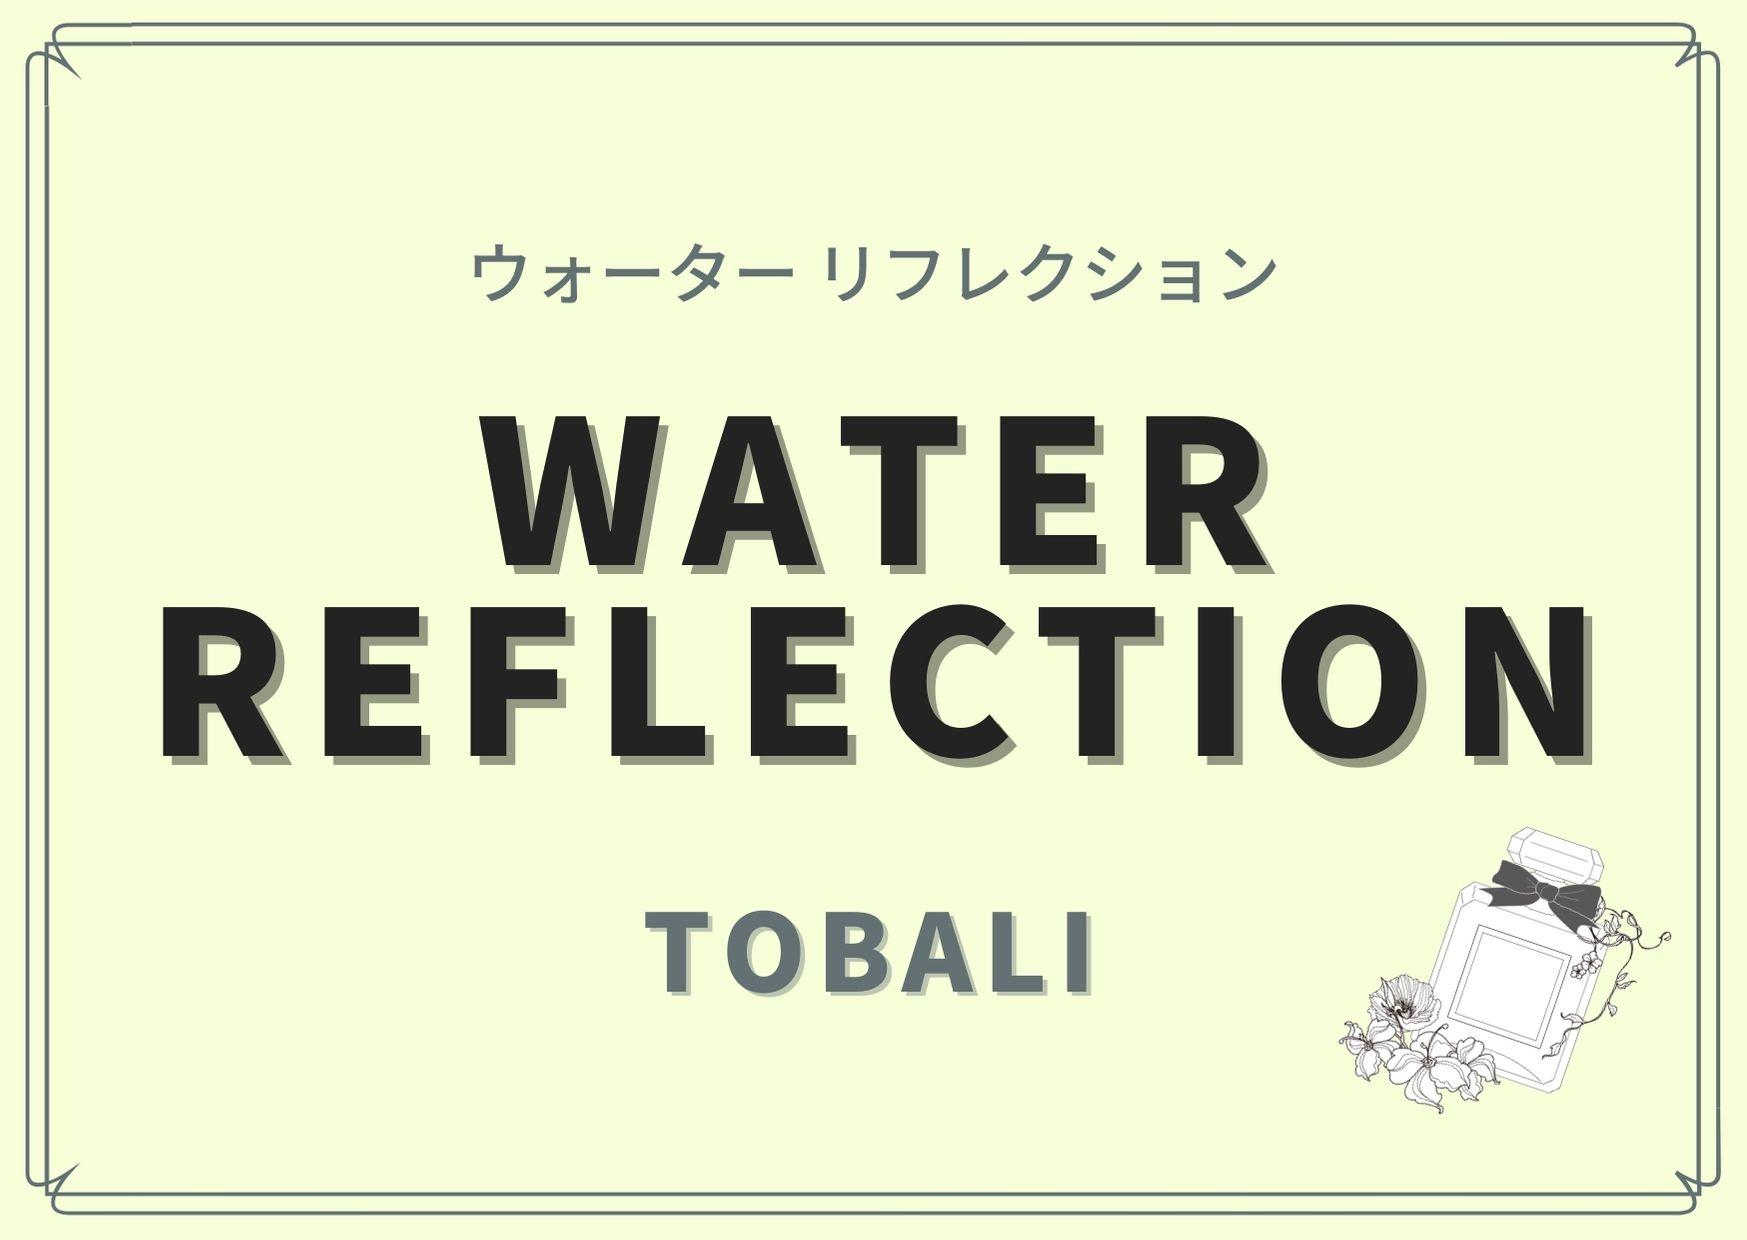 WATER REFLECTION(ウォーター リフレクション)/TOBALI(トバリ)